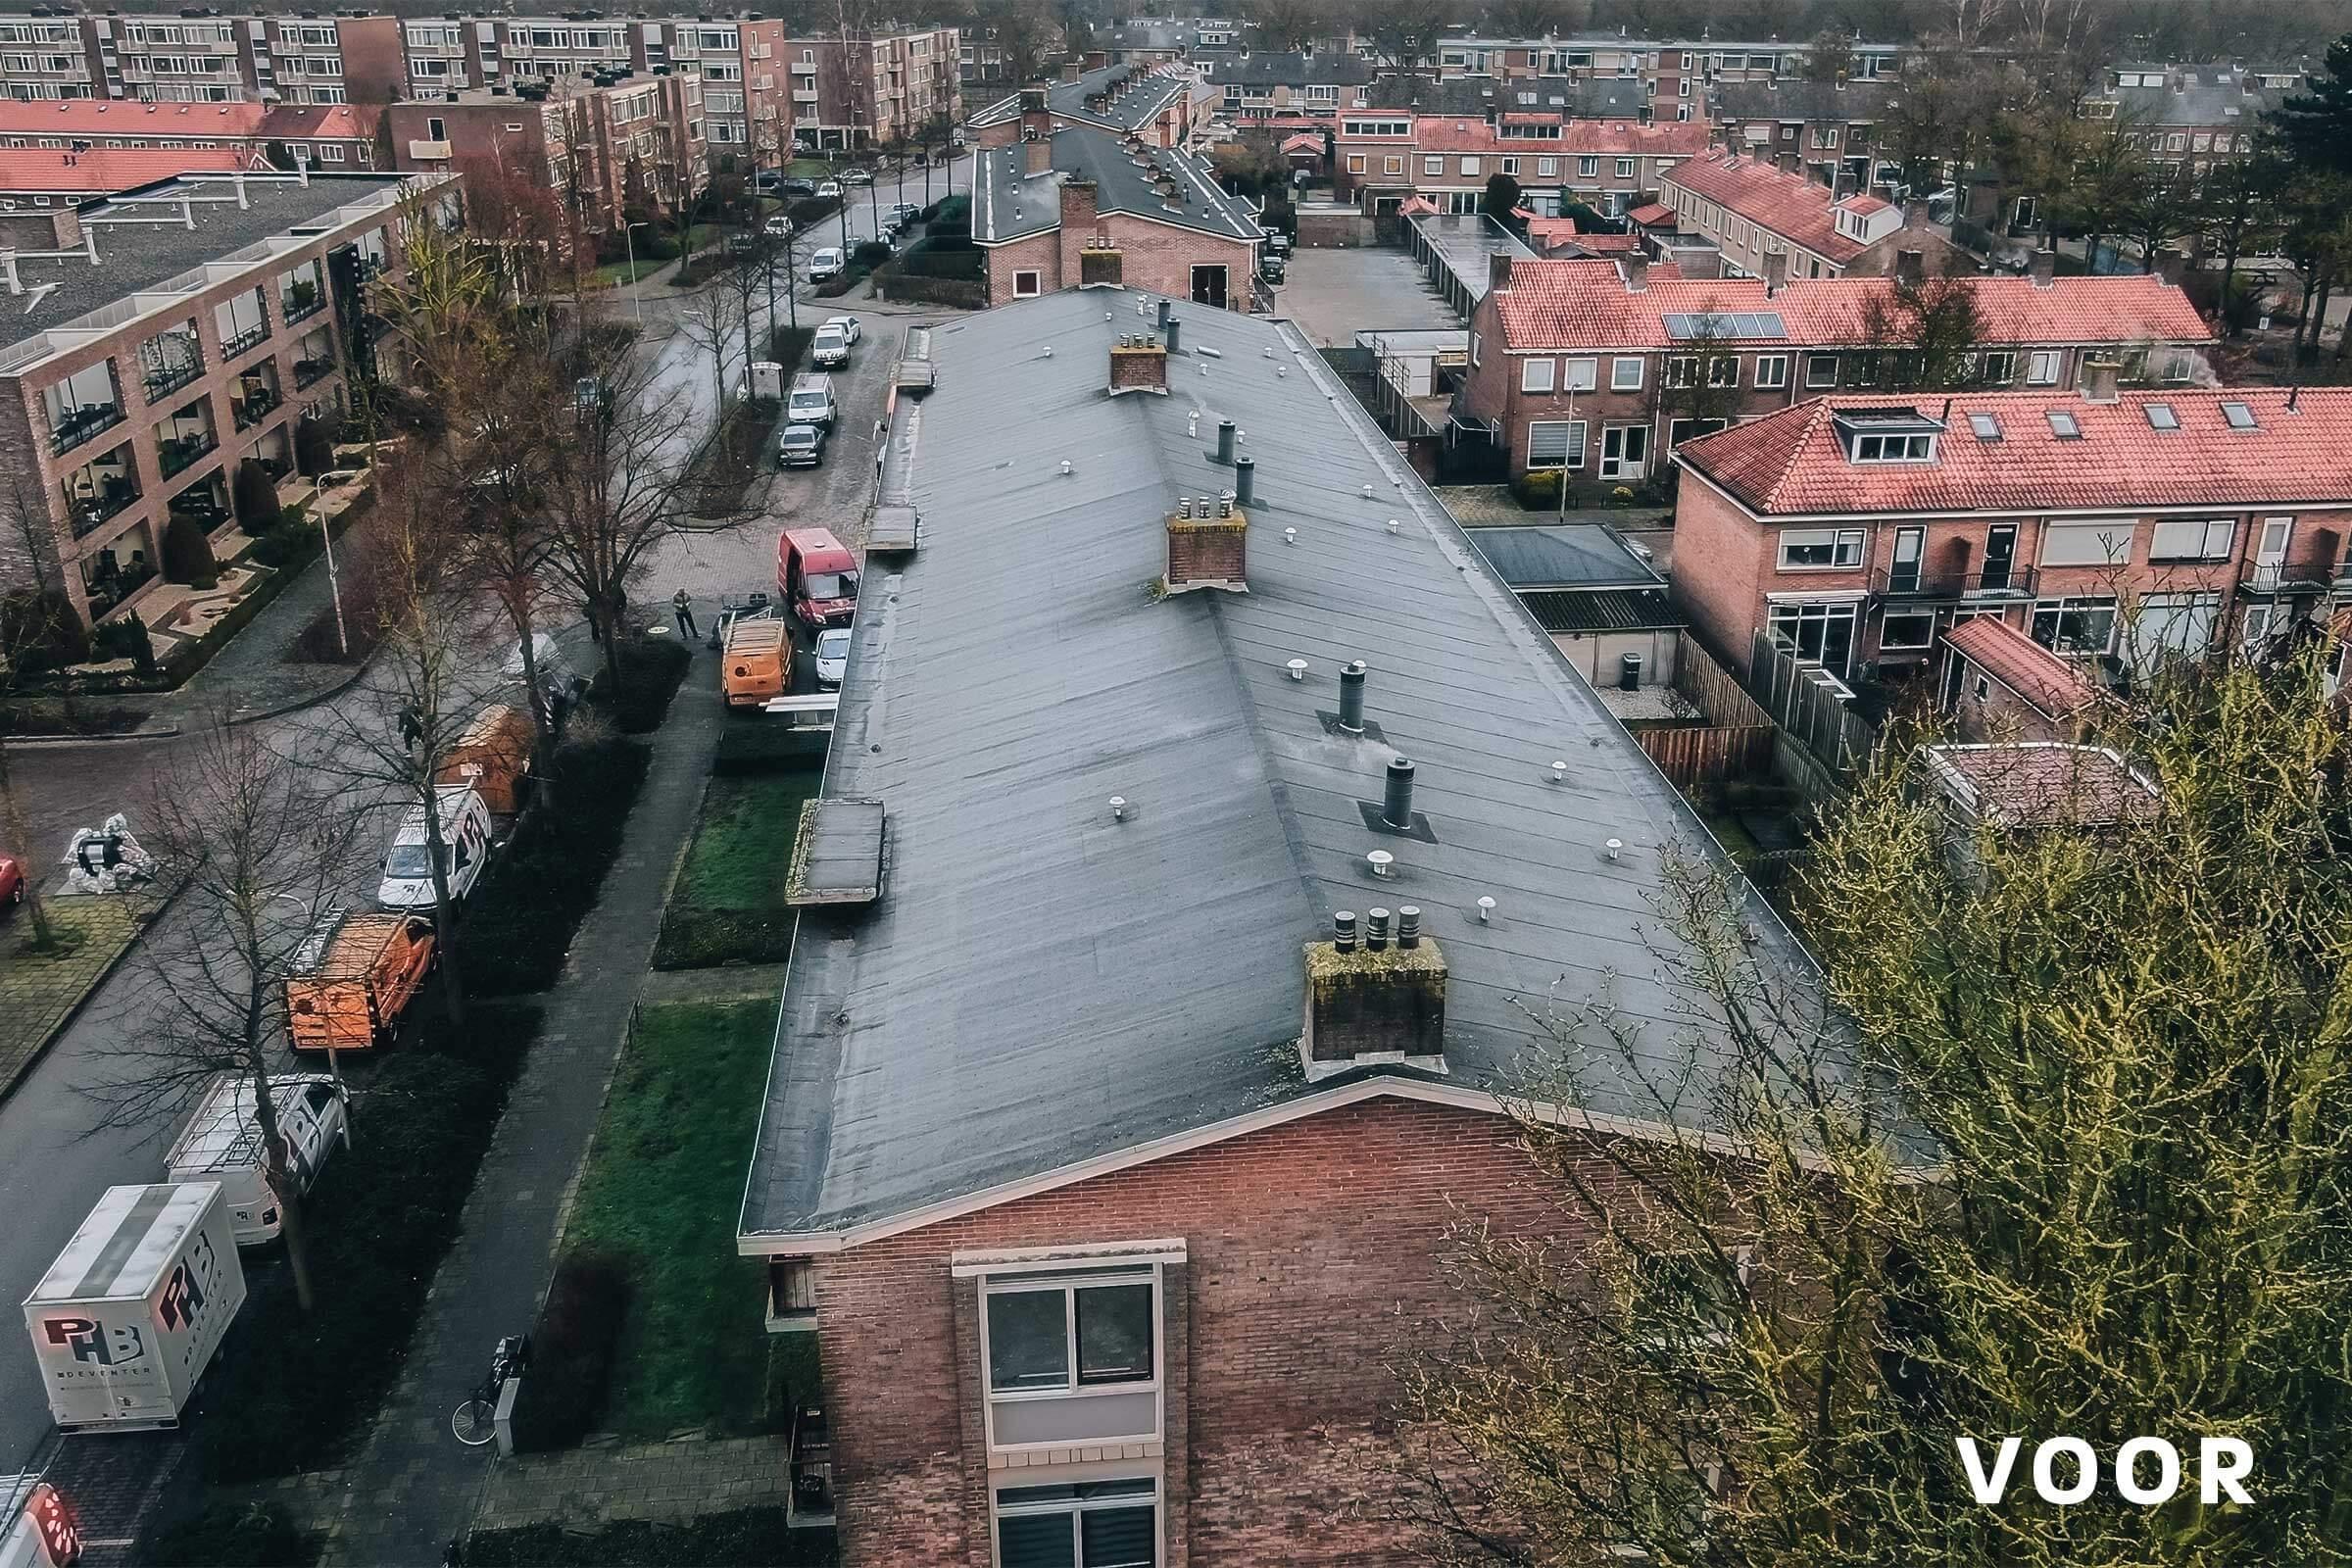 141 appartementen Deventer_Serco dakspecialisten